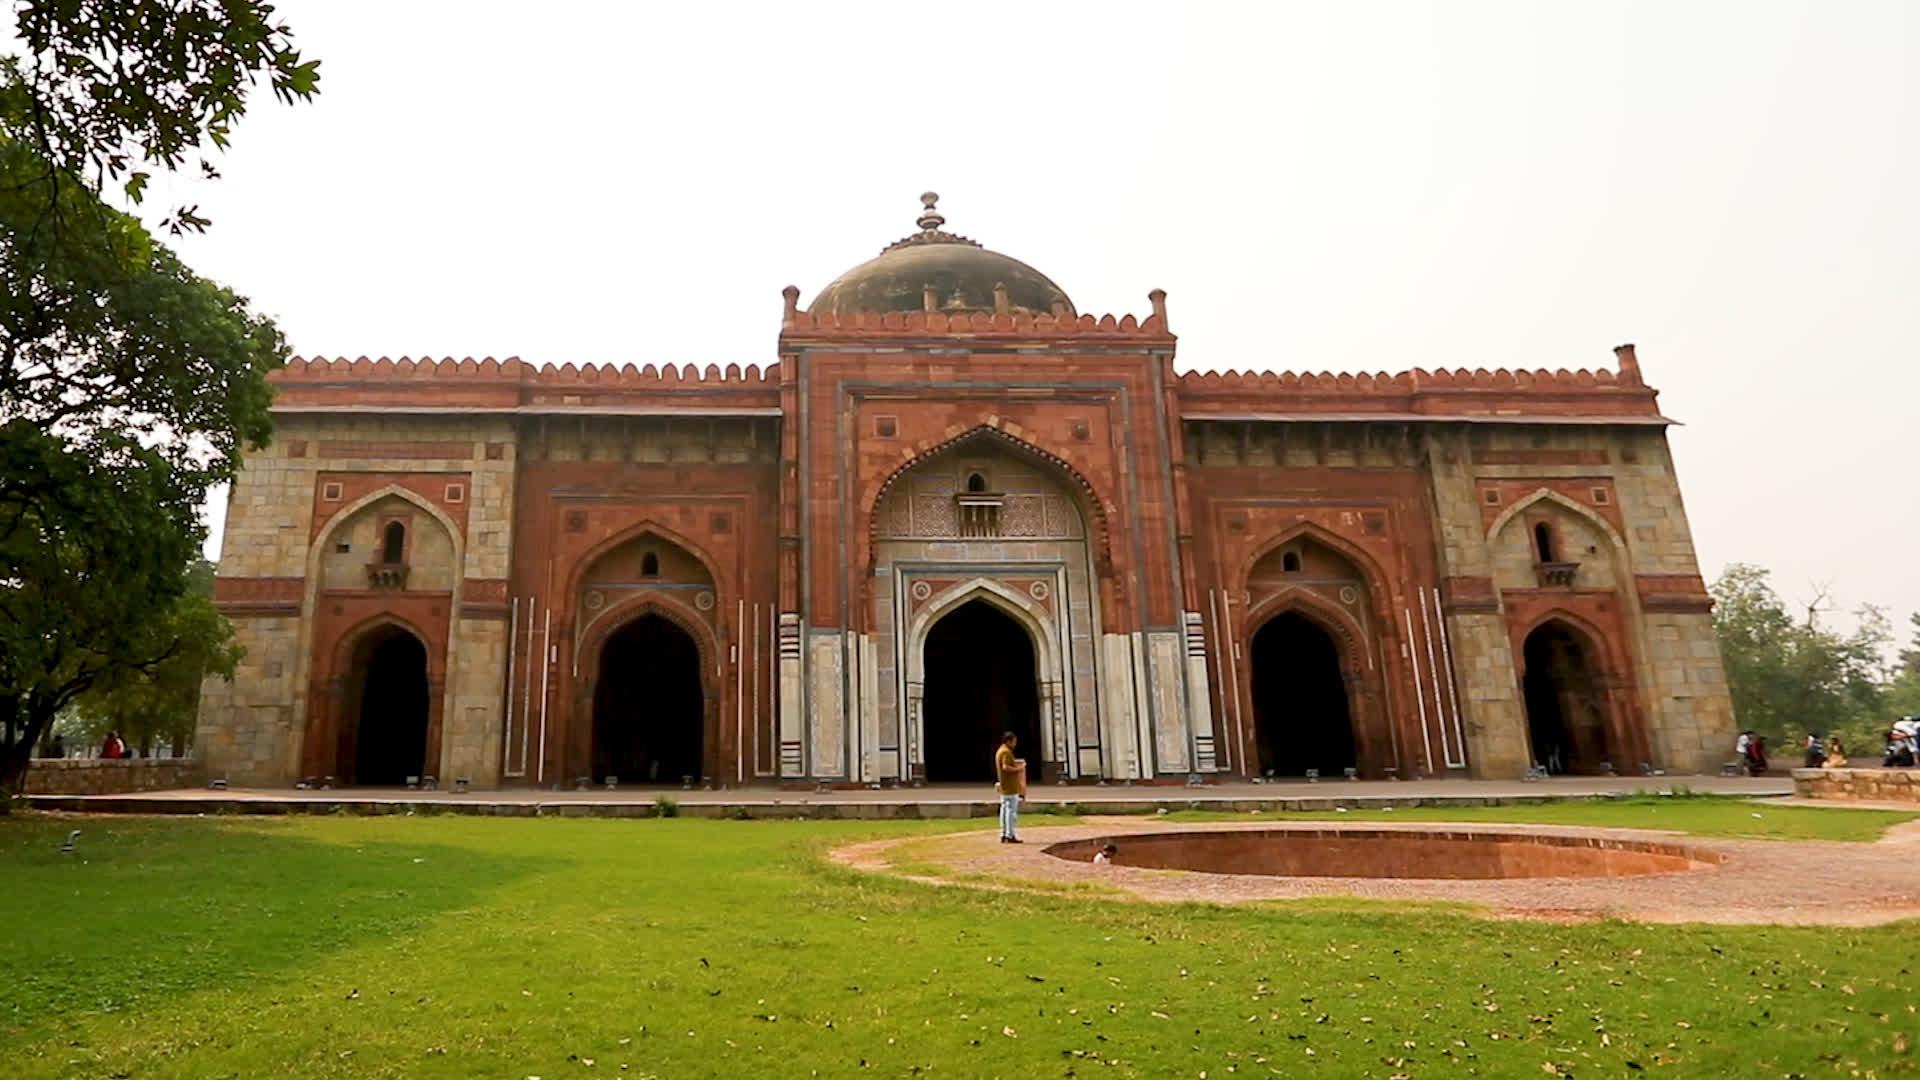 The Qila-i-Kuhna Masjid of Purana Qila